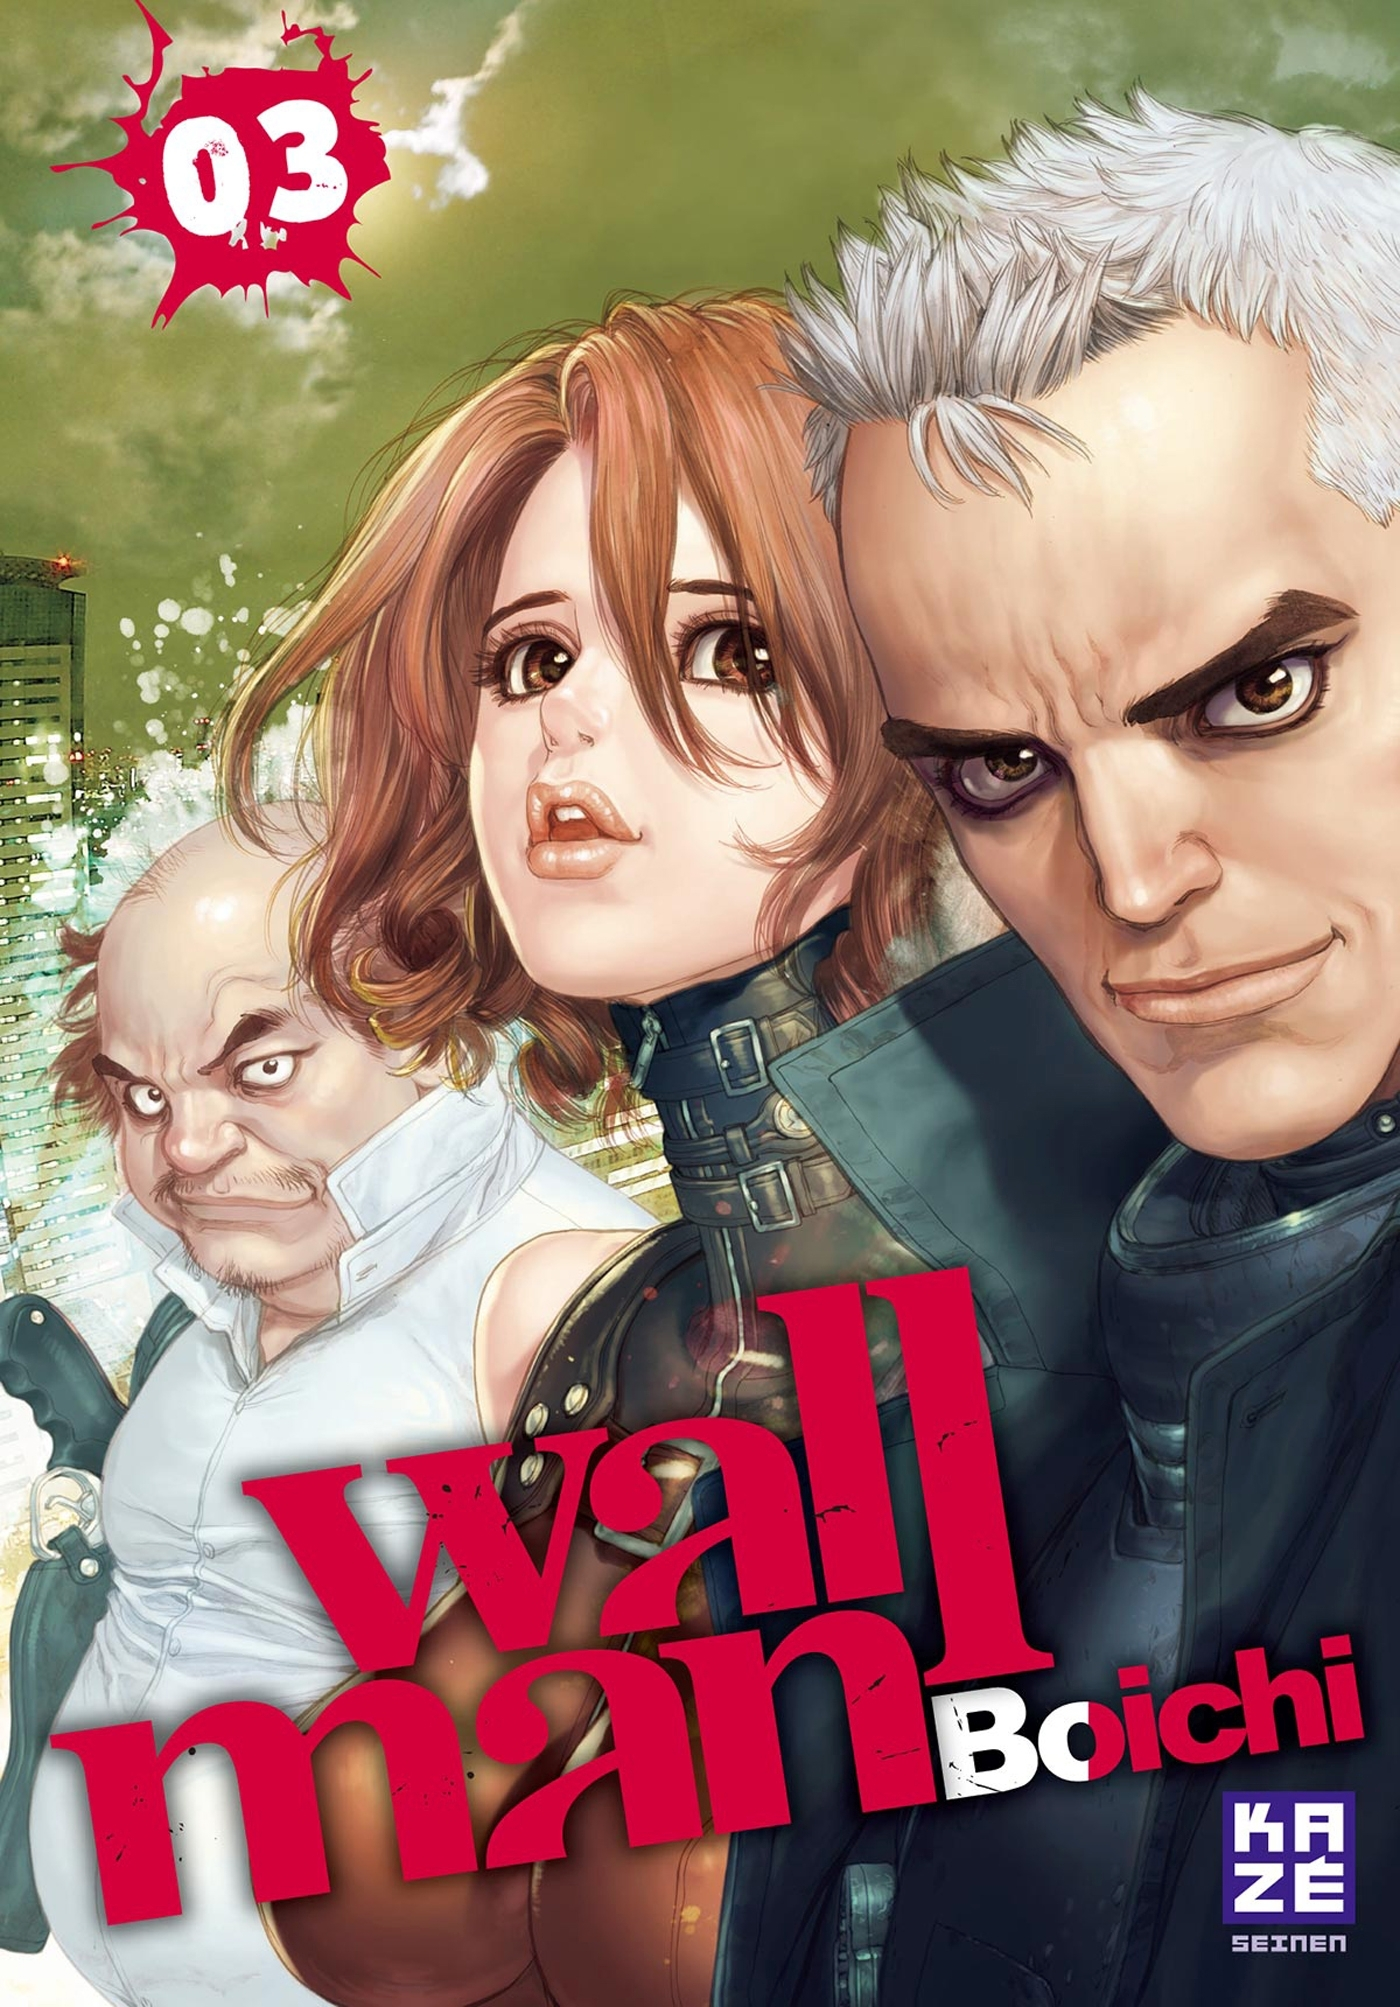 WALLMAN T03